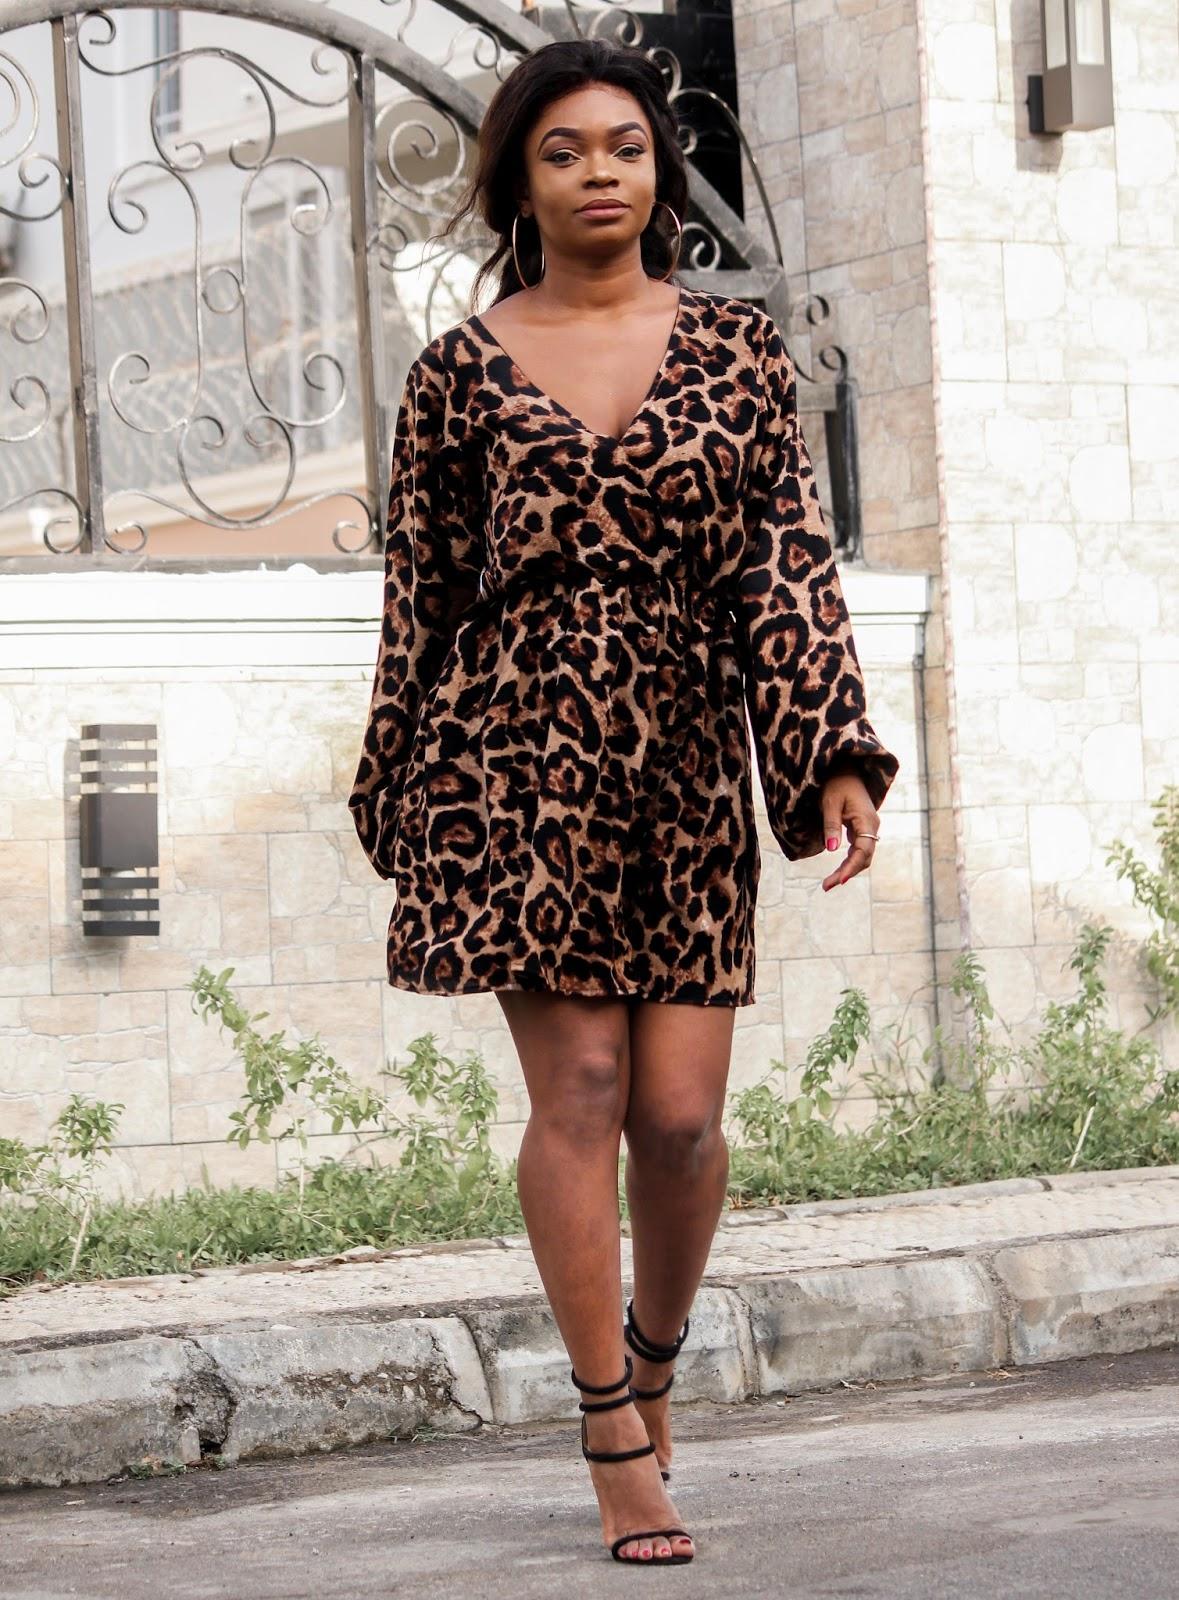 LEOPARD PRINT DRESS - Leopard Print Dress by Porshher and black sandals from Public Desire